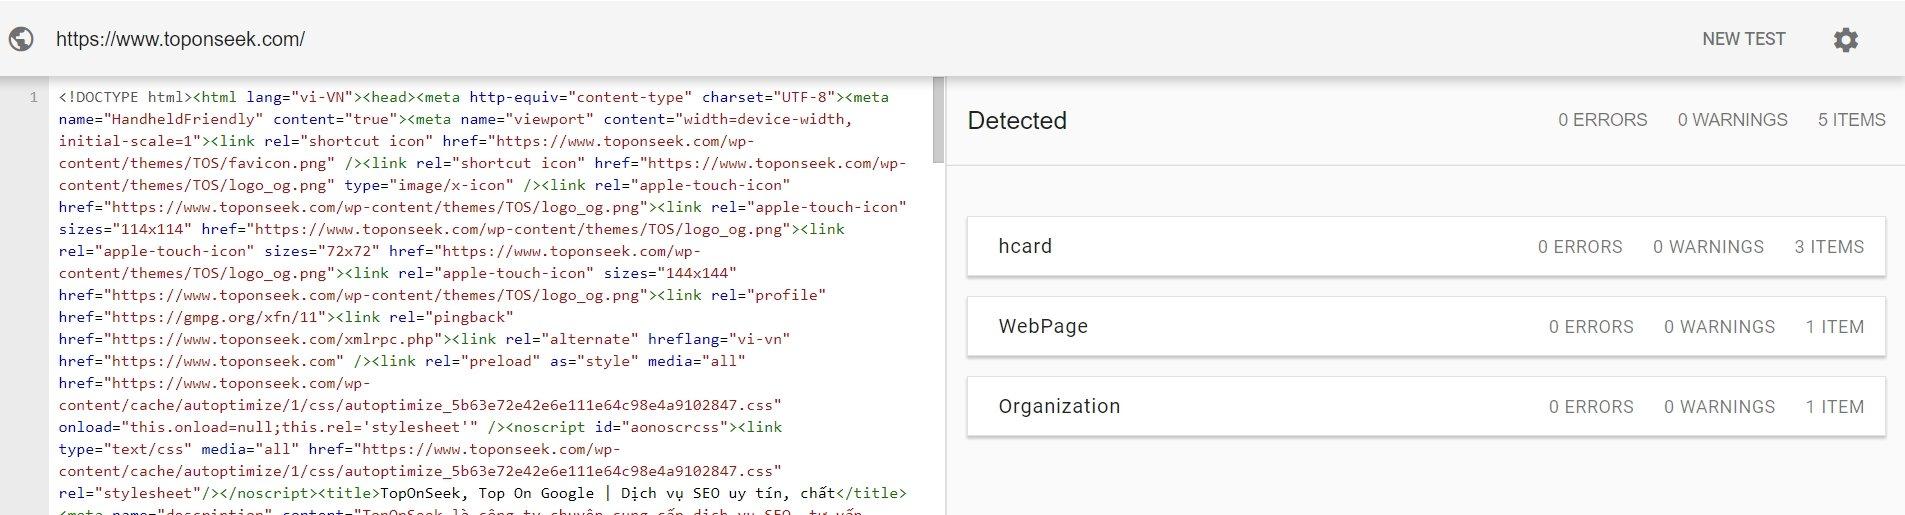 cấu trúc dữ liệu website